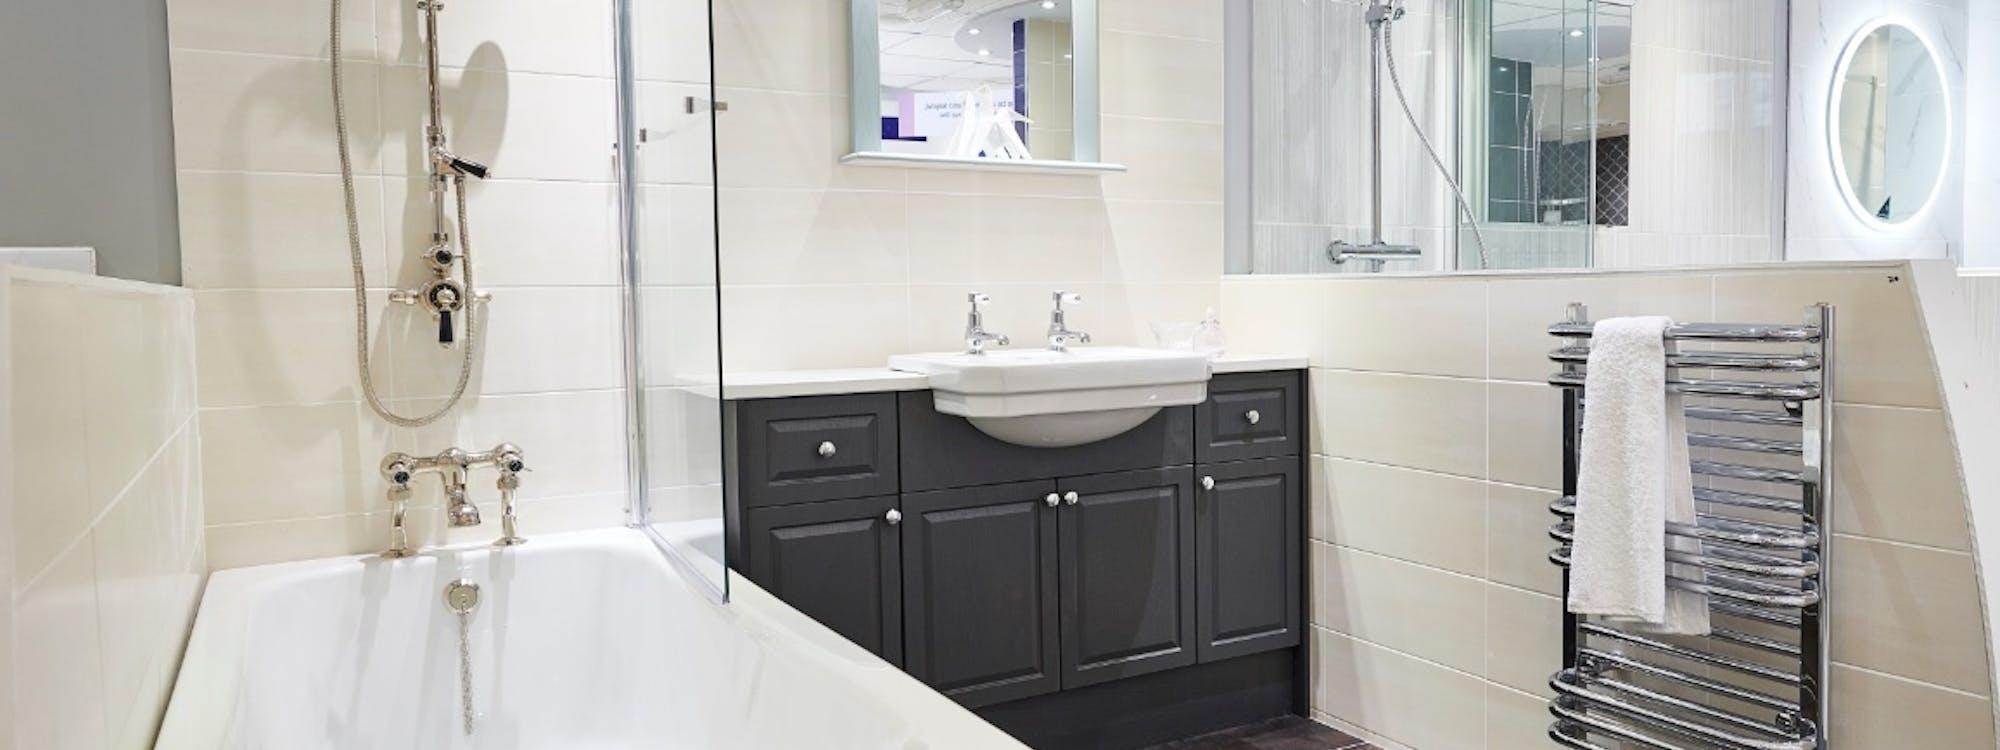 York Bathrooms | York Bathroom Showrooms | More Bathrooms